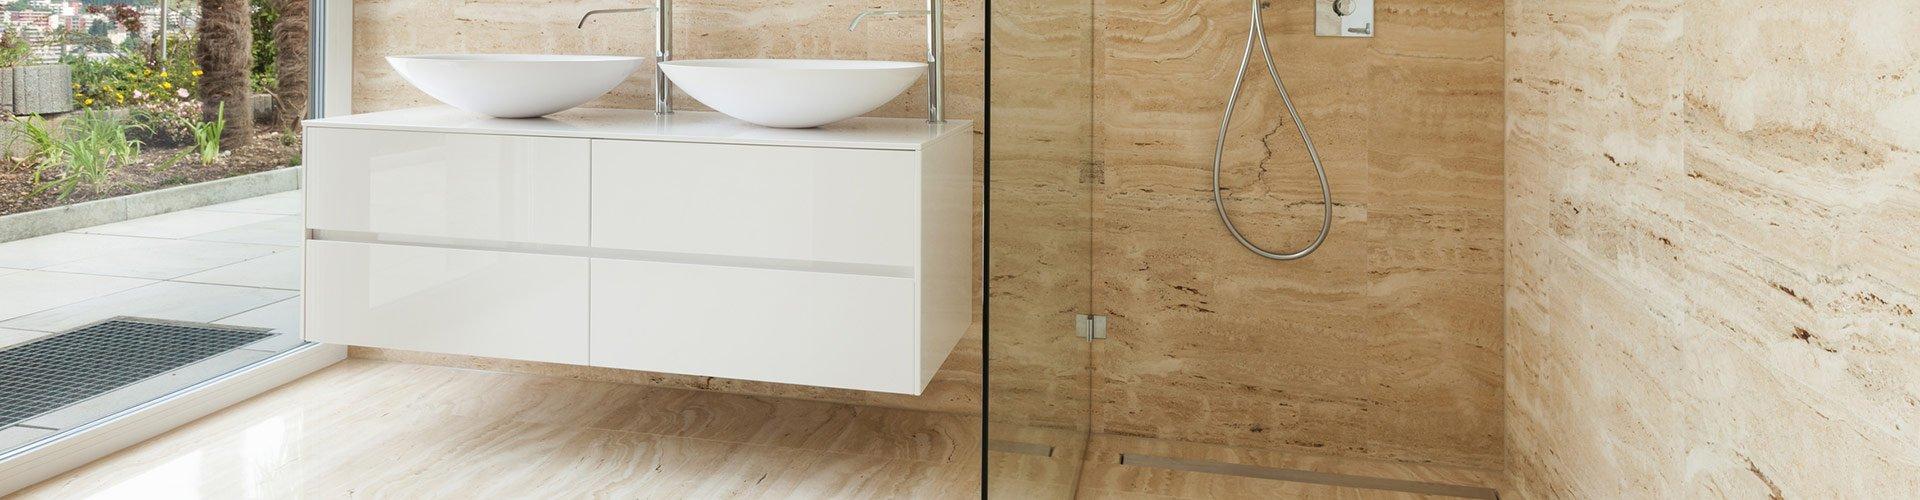 combia duschkabinen duschen glas duschabtrennungen dusch boden elemente duschwannen. Black Bedroom Furniture Sets. Home Design Ideas